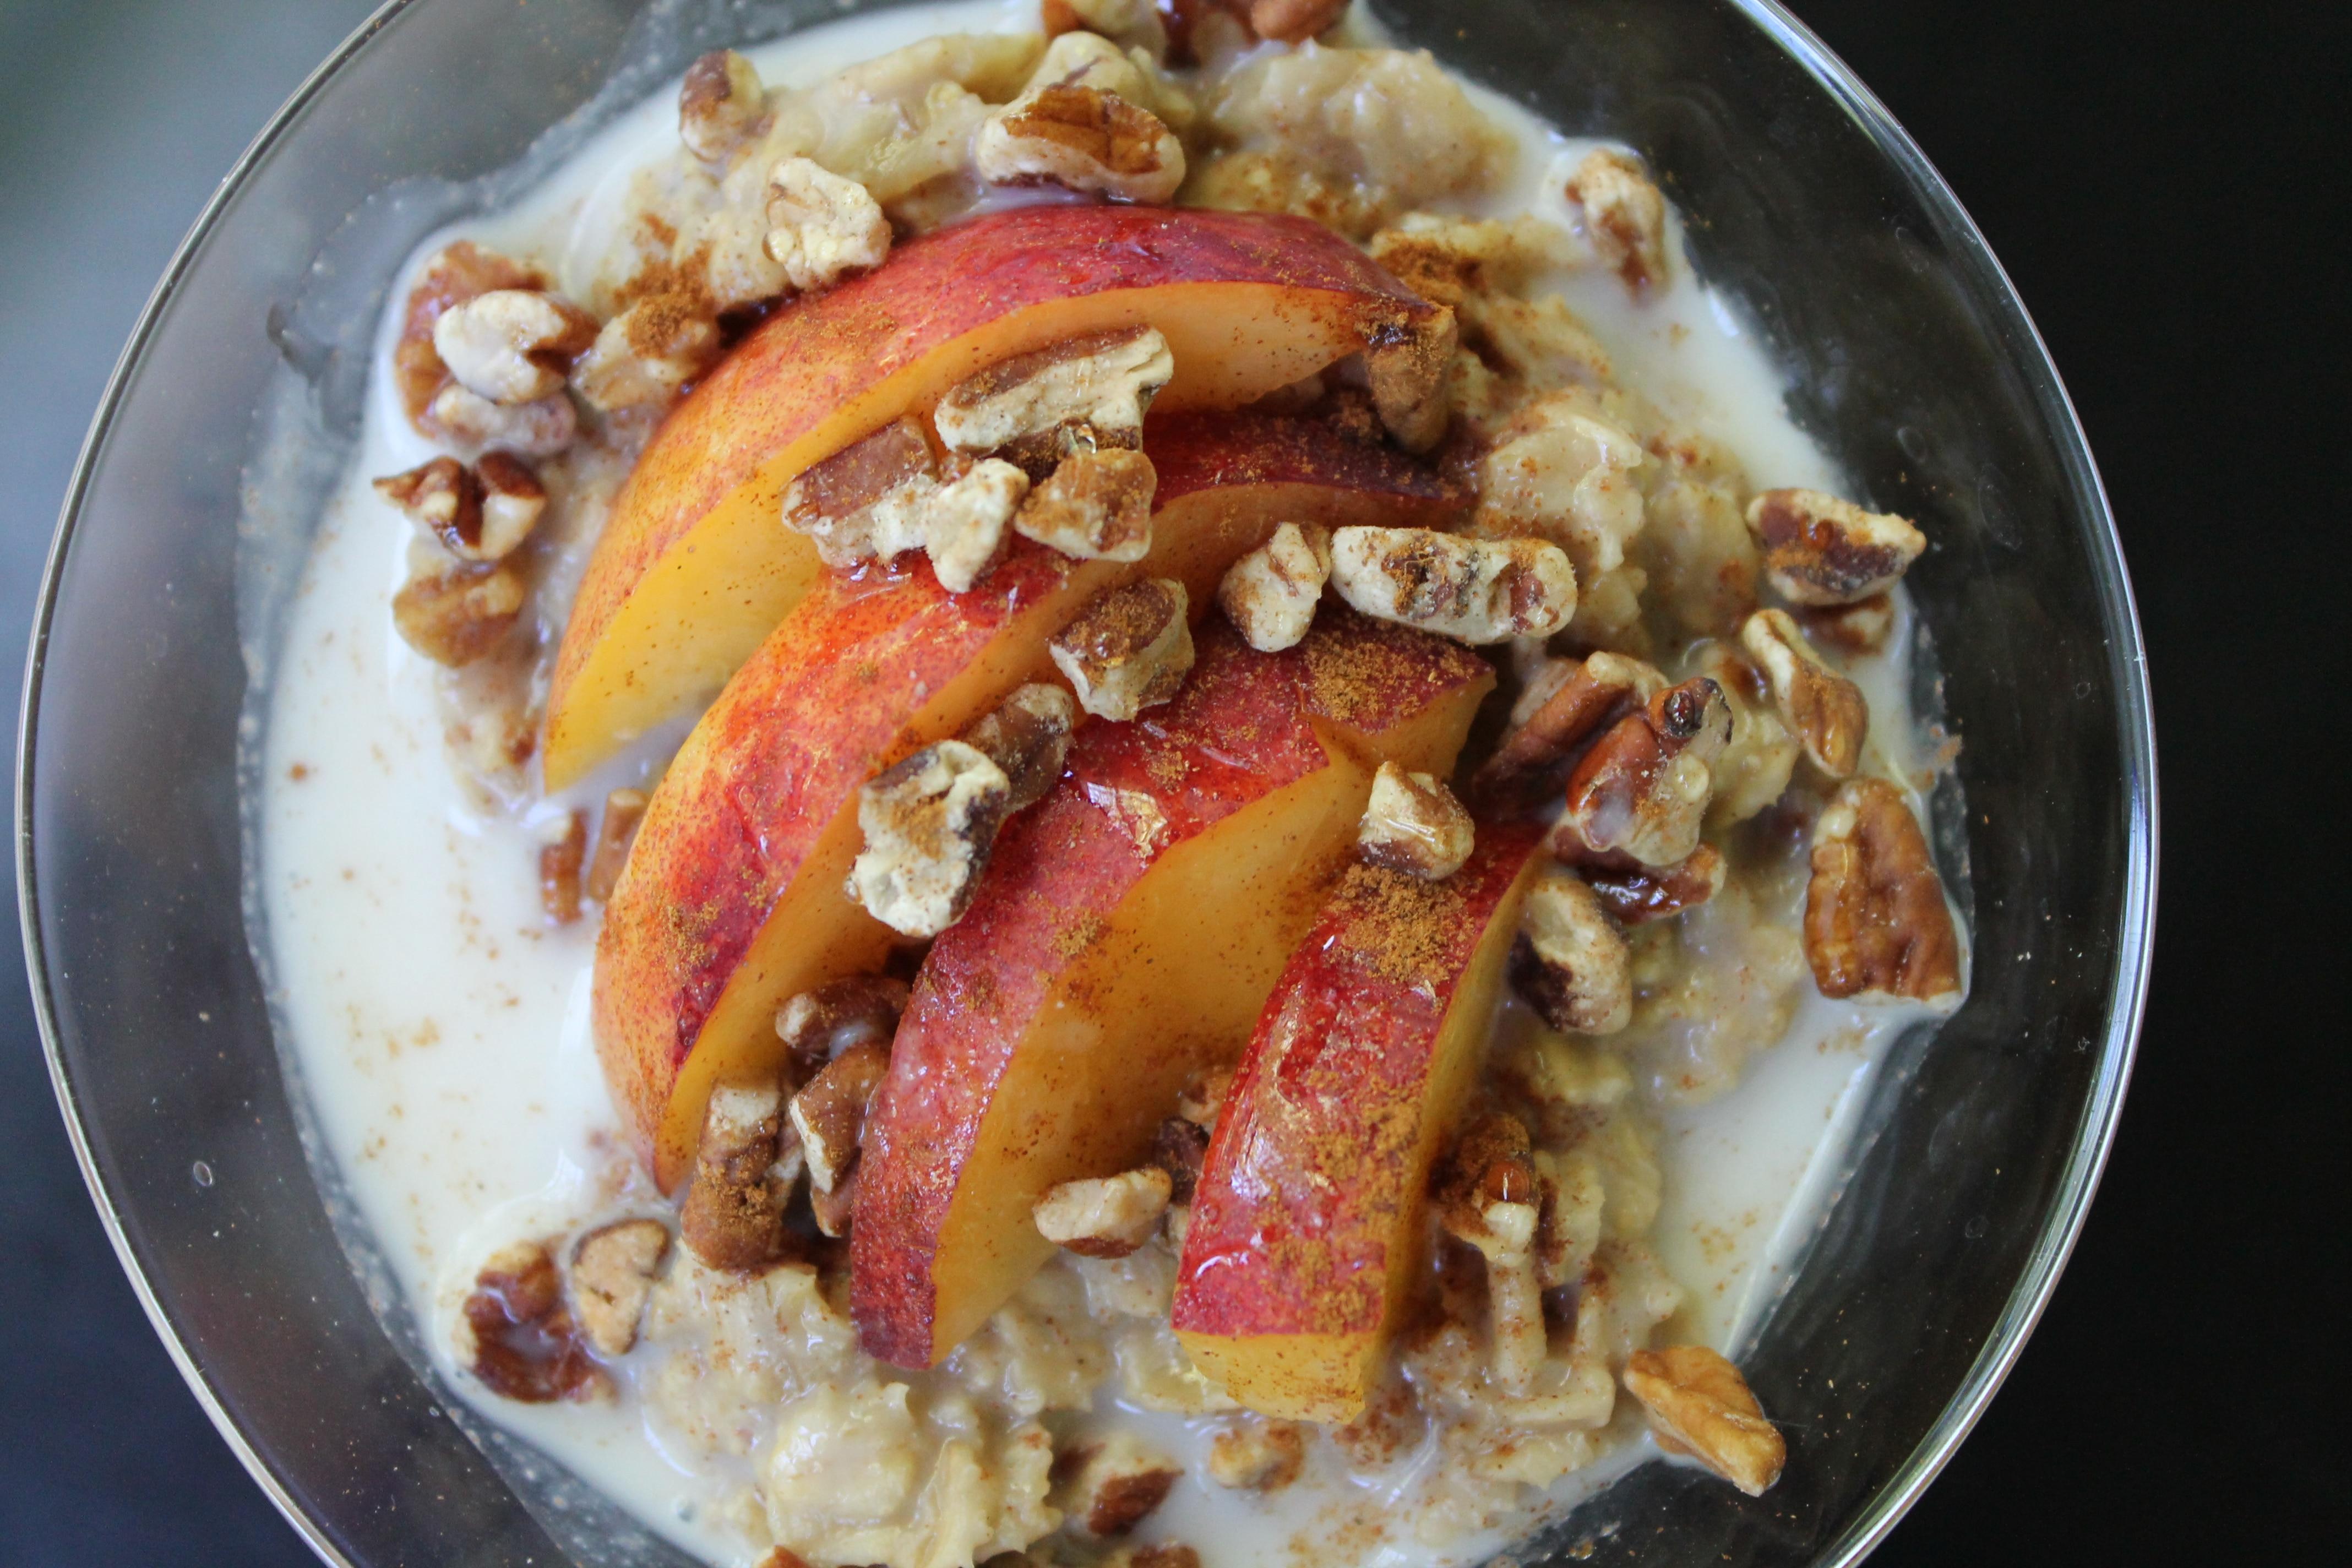 Chai Tea Oatmeal with Peaches, Pecans, and Honey